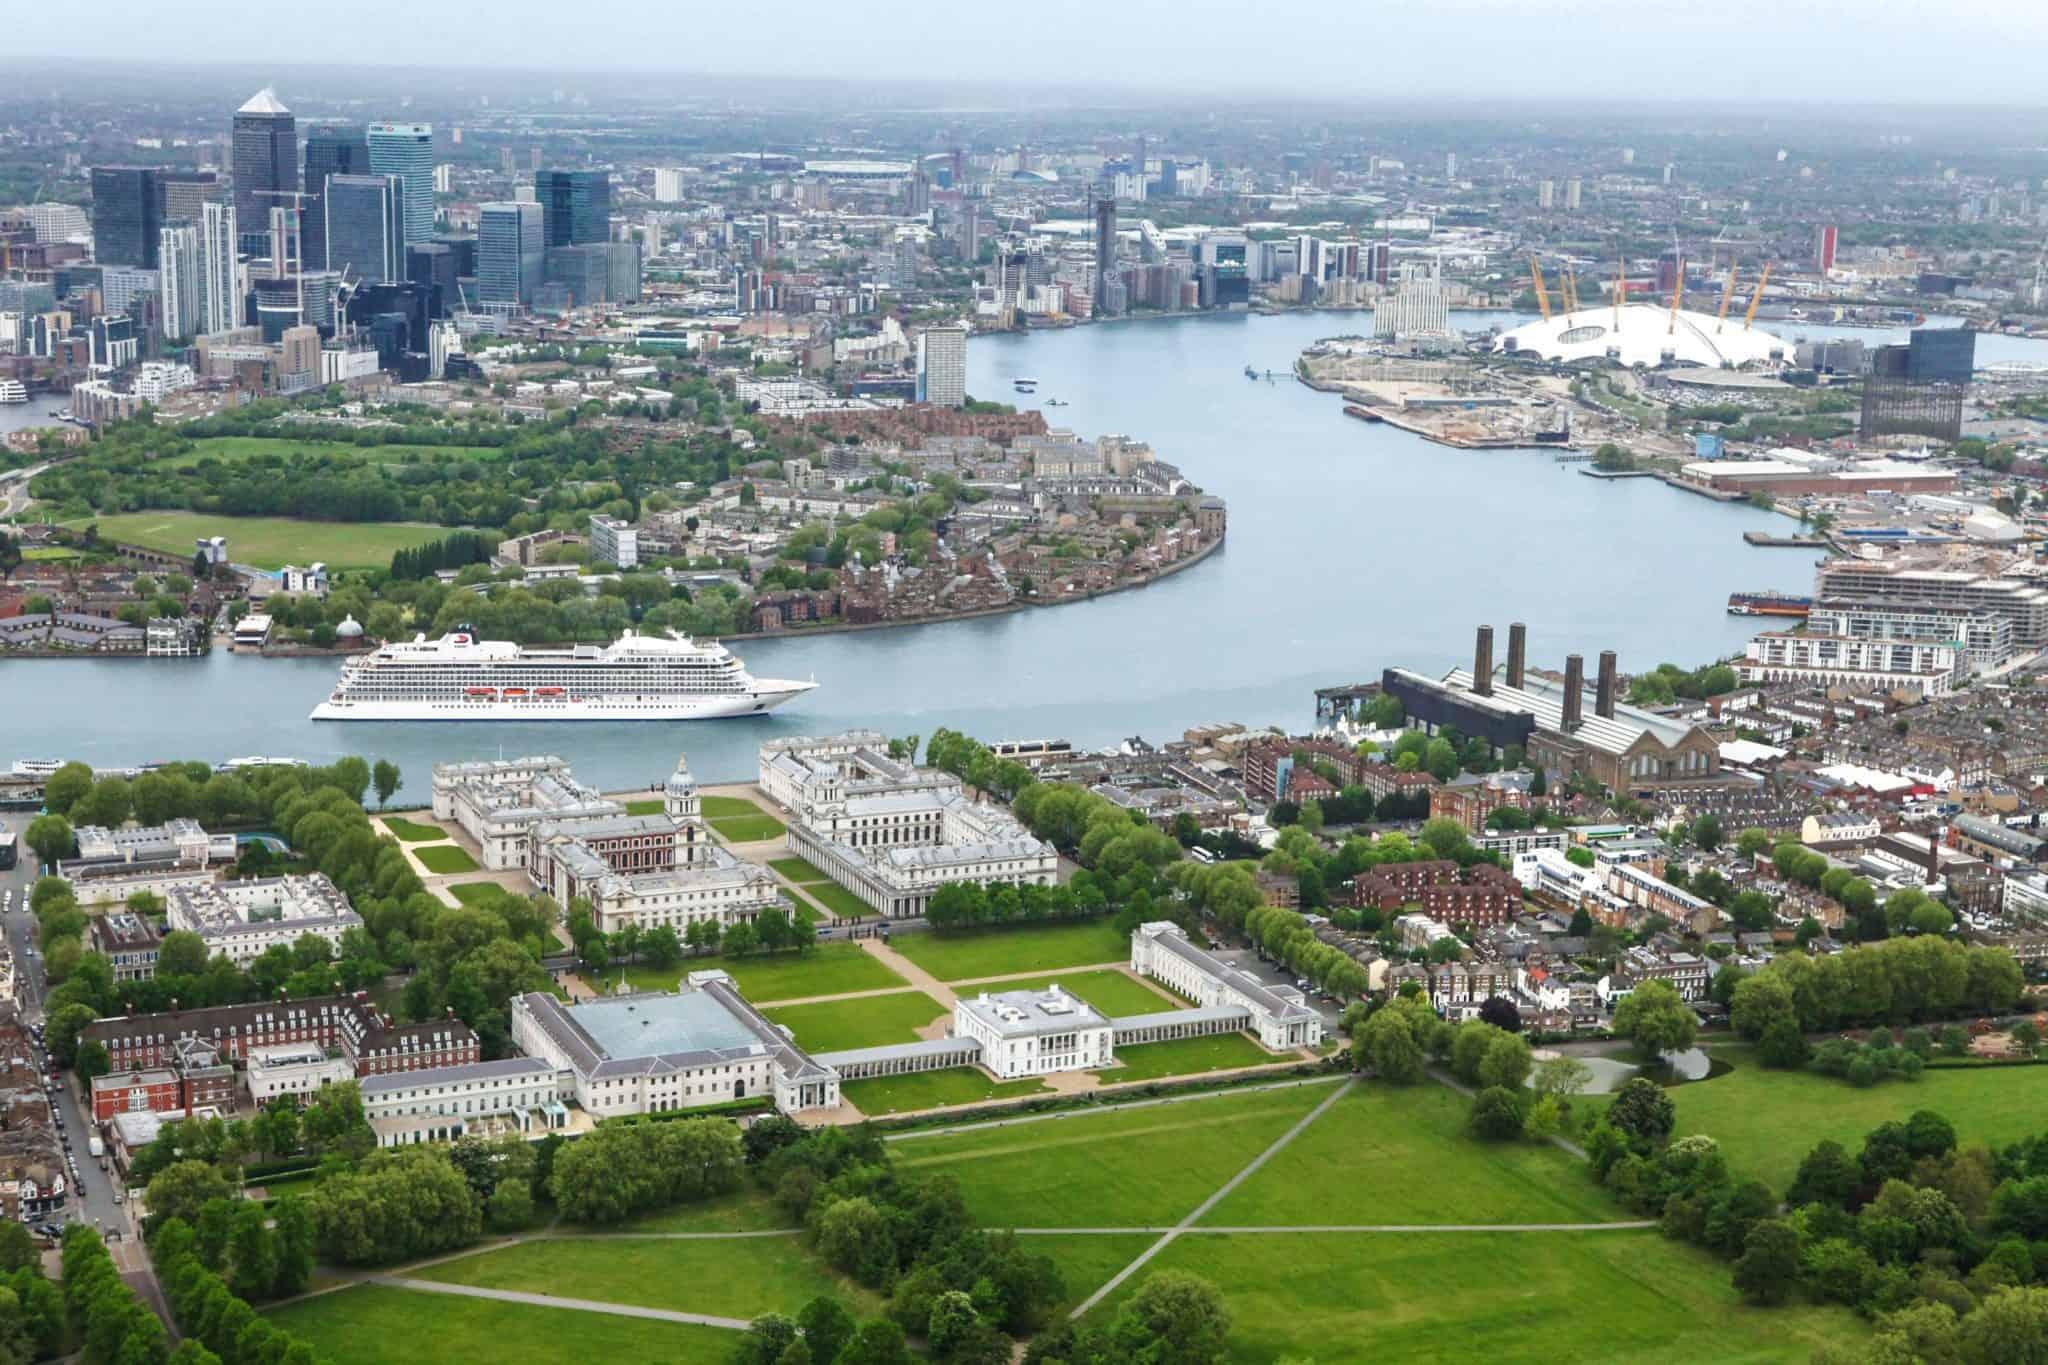 viking star london greenwich thames river